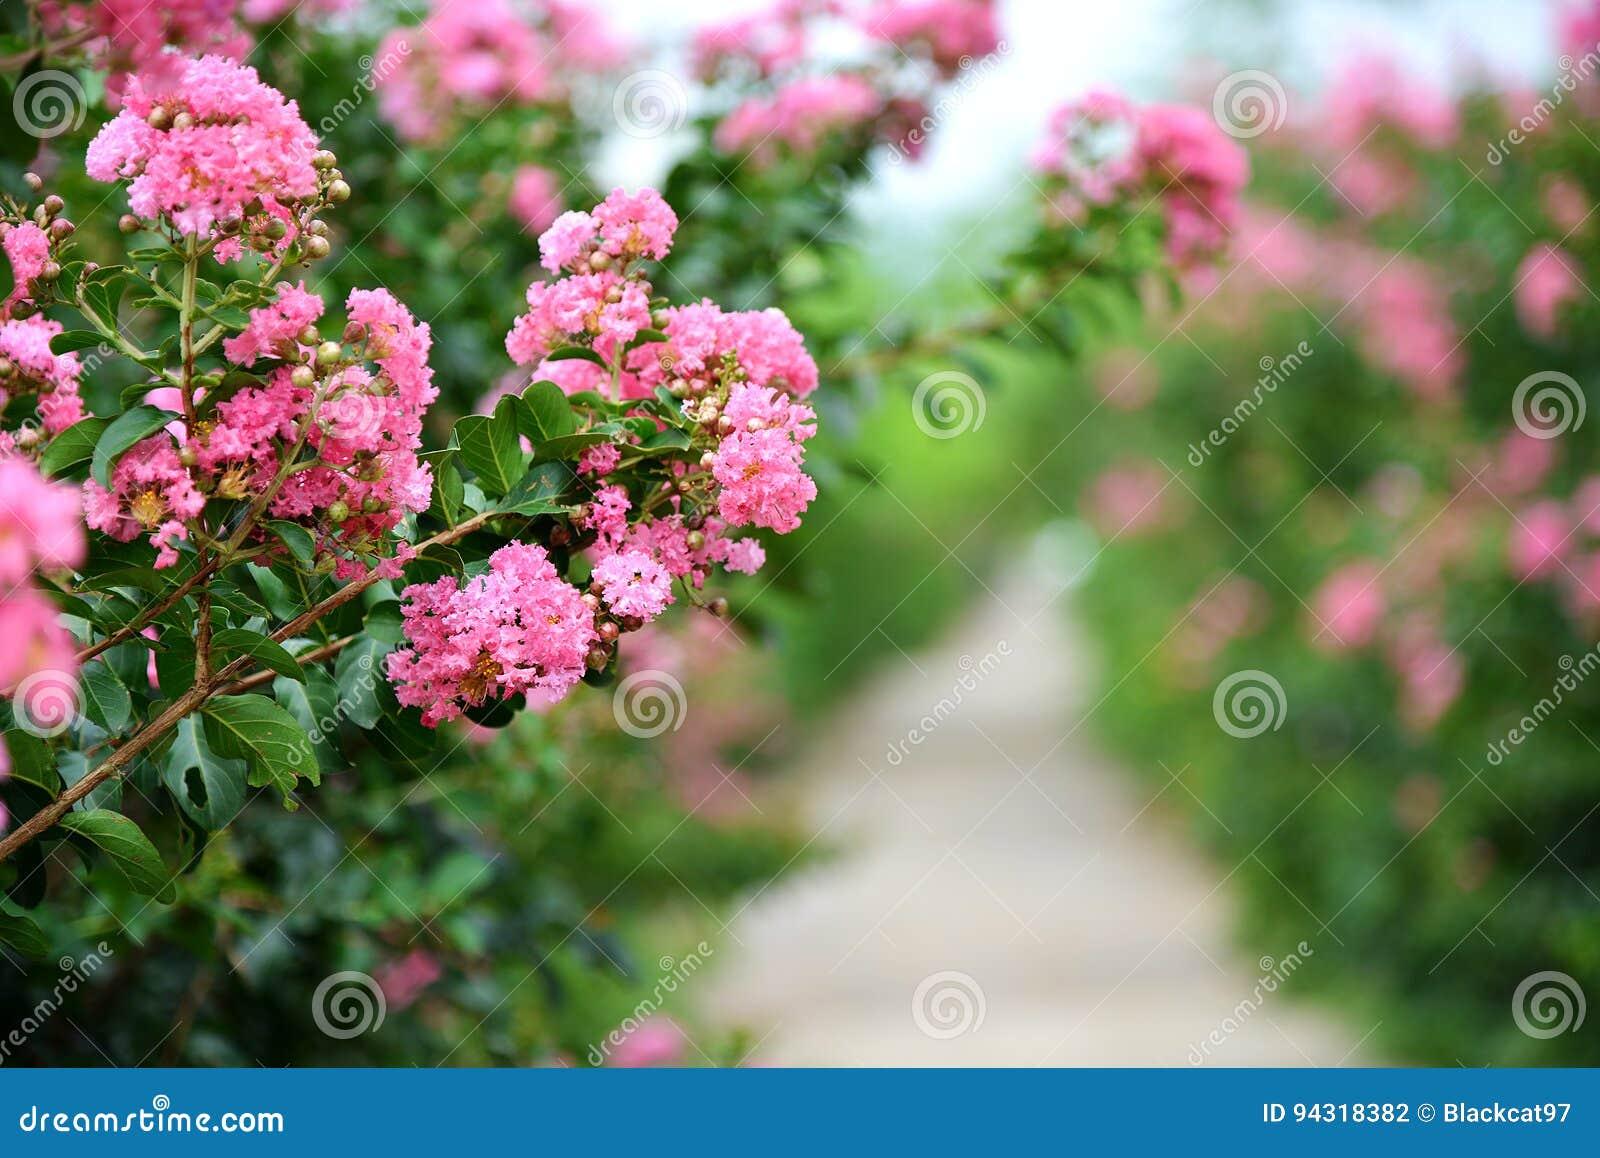 Kreppmyrtenblume